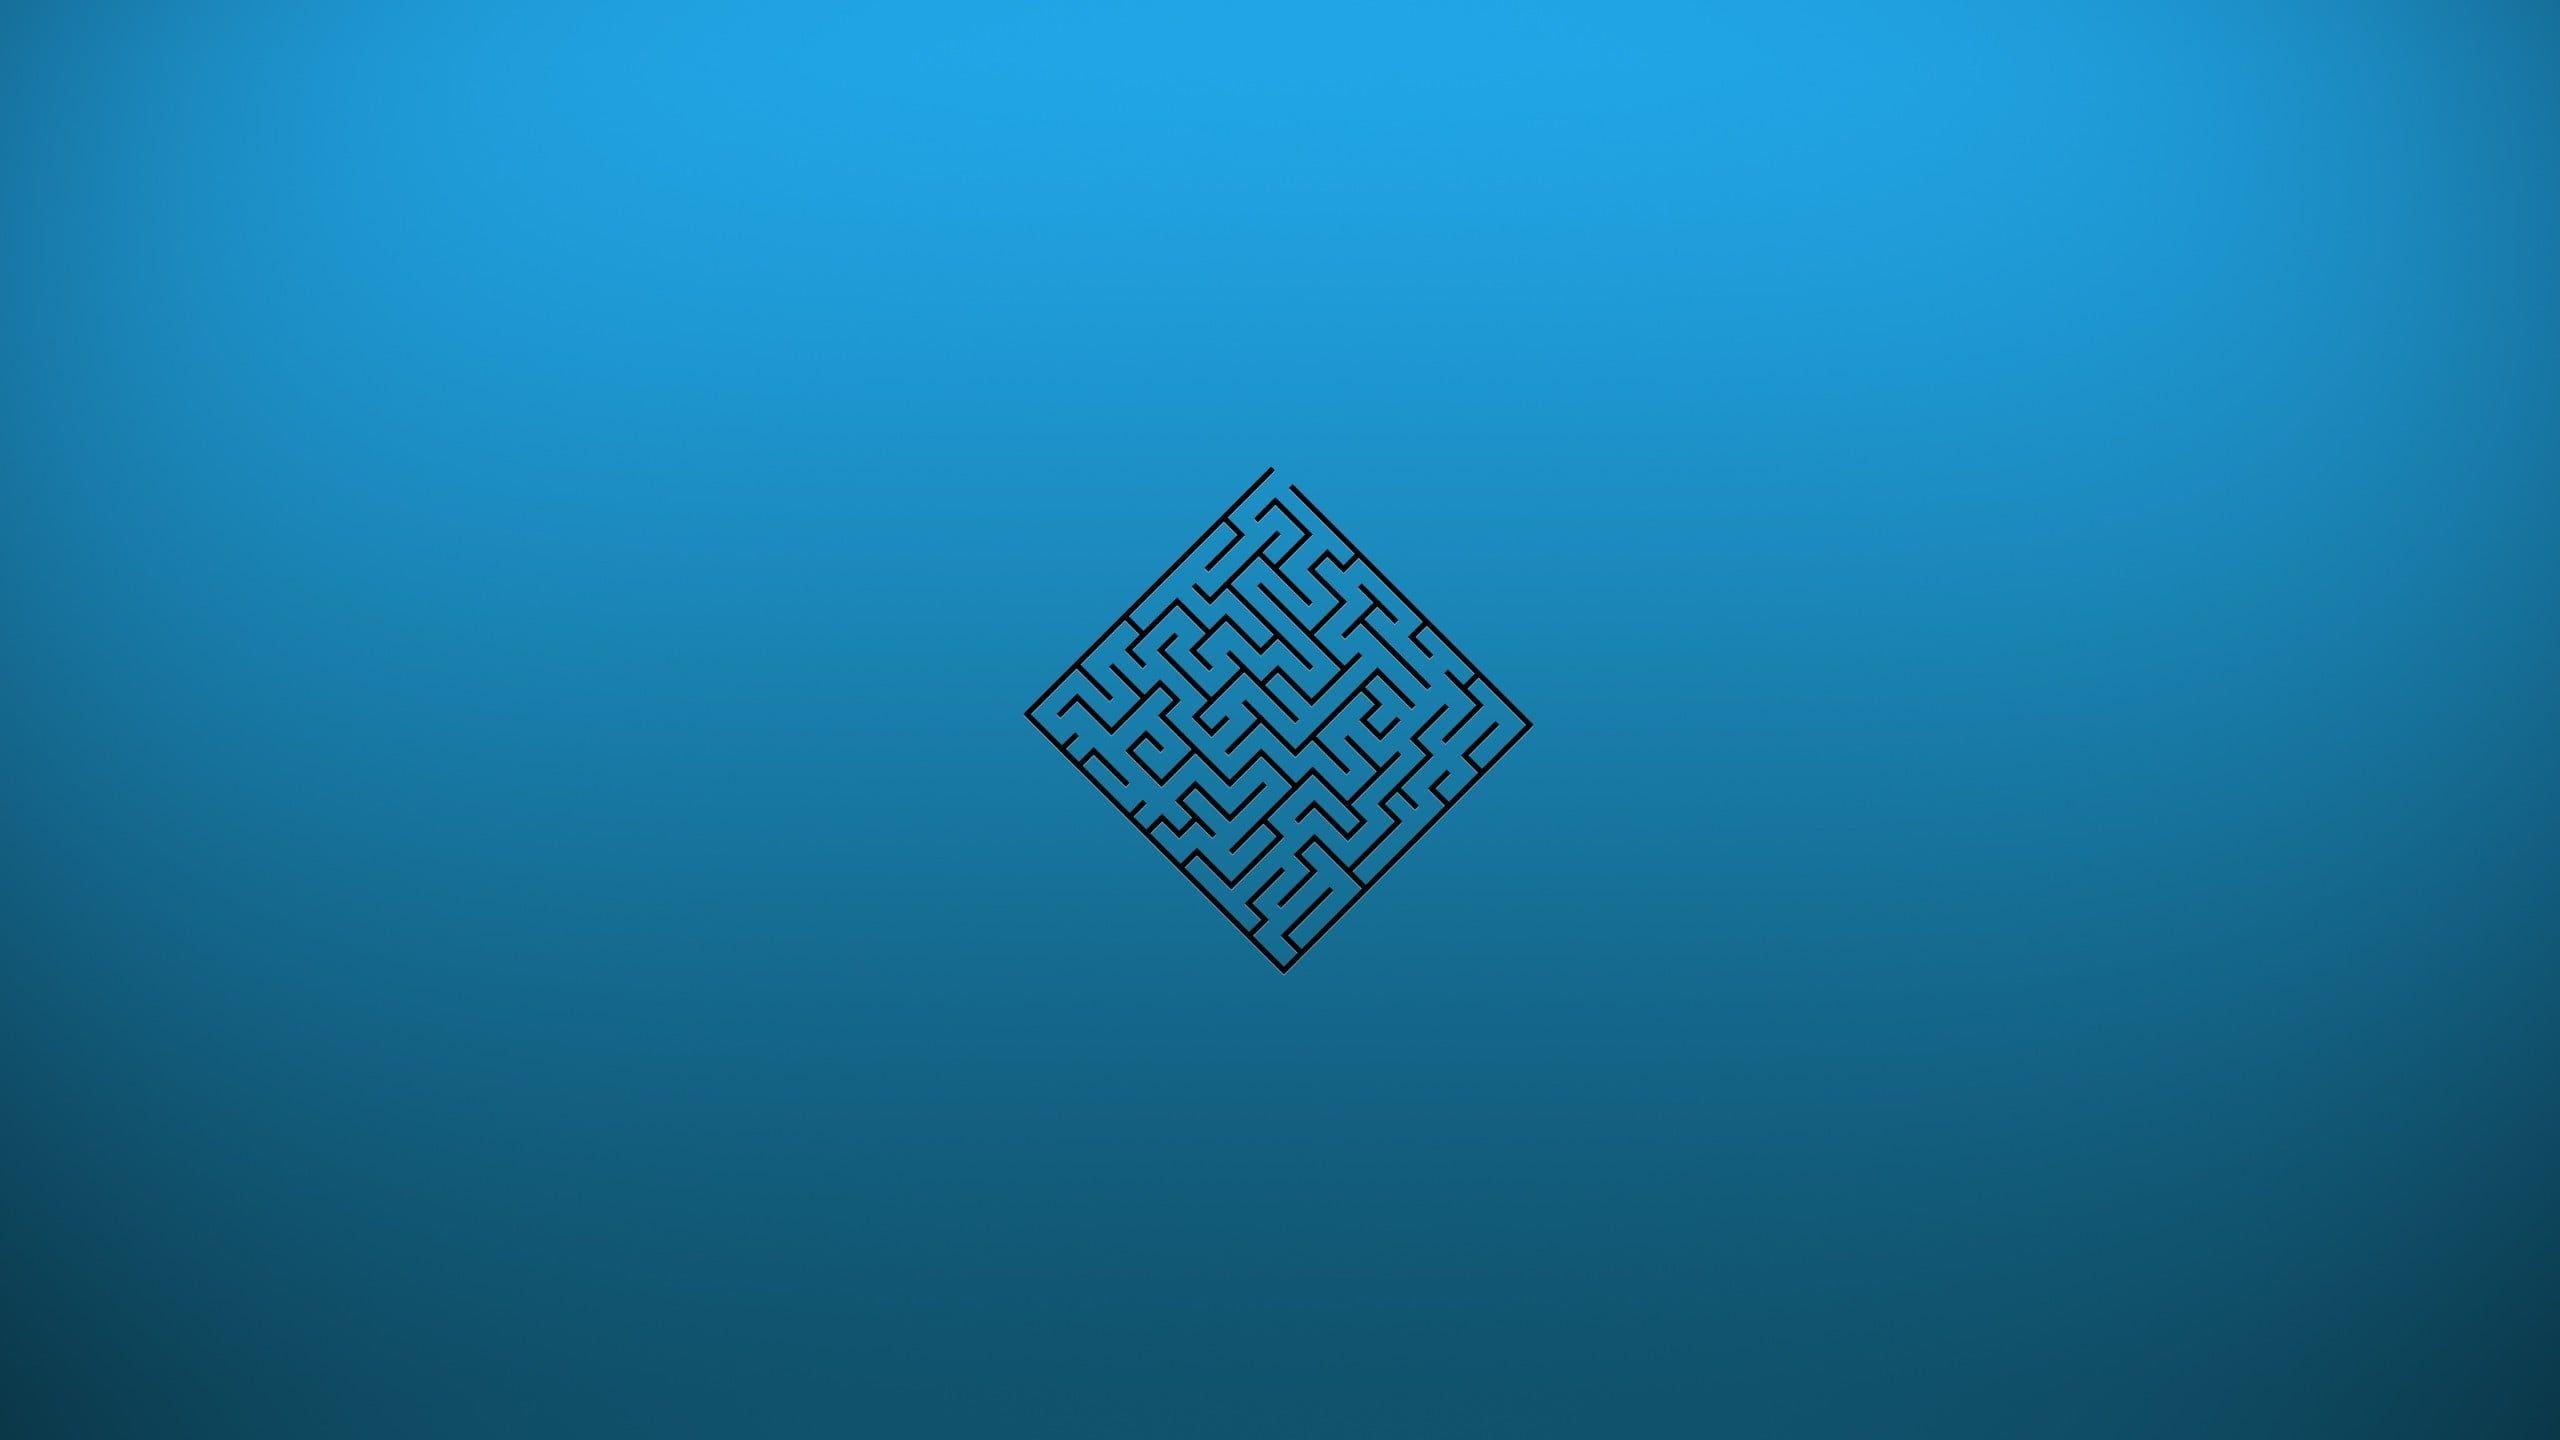 Cube Maze Illustration Maze Artwork Blue Background 2k Wallpaper Hdwallpaper Desktop Illustration Desktop Blu Iphone 8 plus 4k maze wallpaper